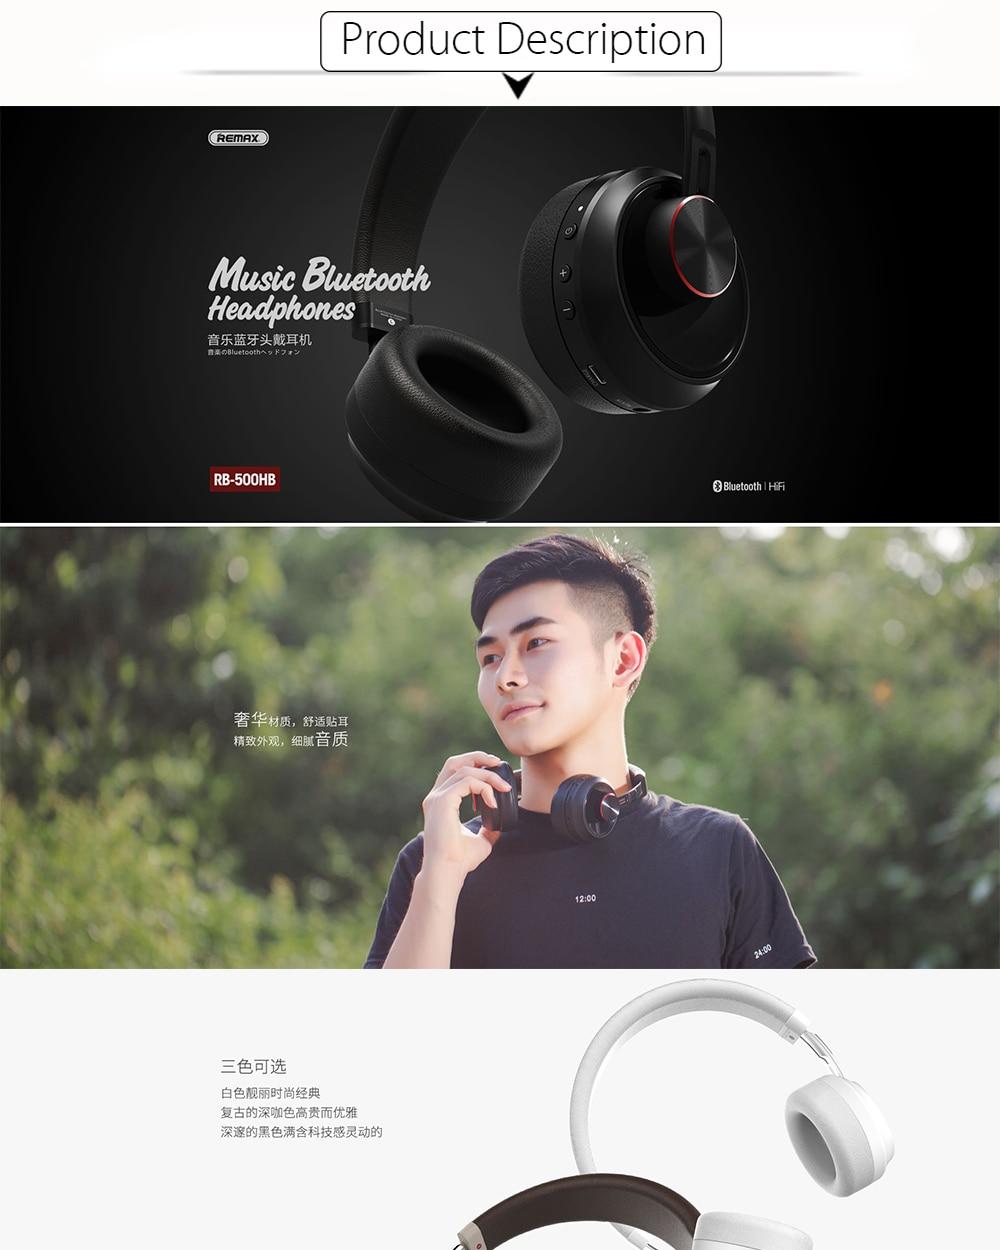 2017 Remax wireless Music bluetooth headphones With Microphone RB-500HB Bluetooth4.1 HiFi HD Quality Dynamic Headband Headset